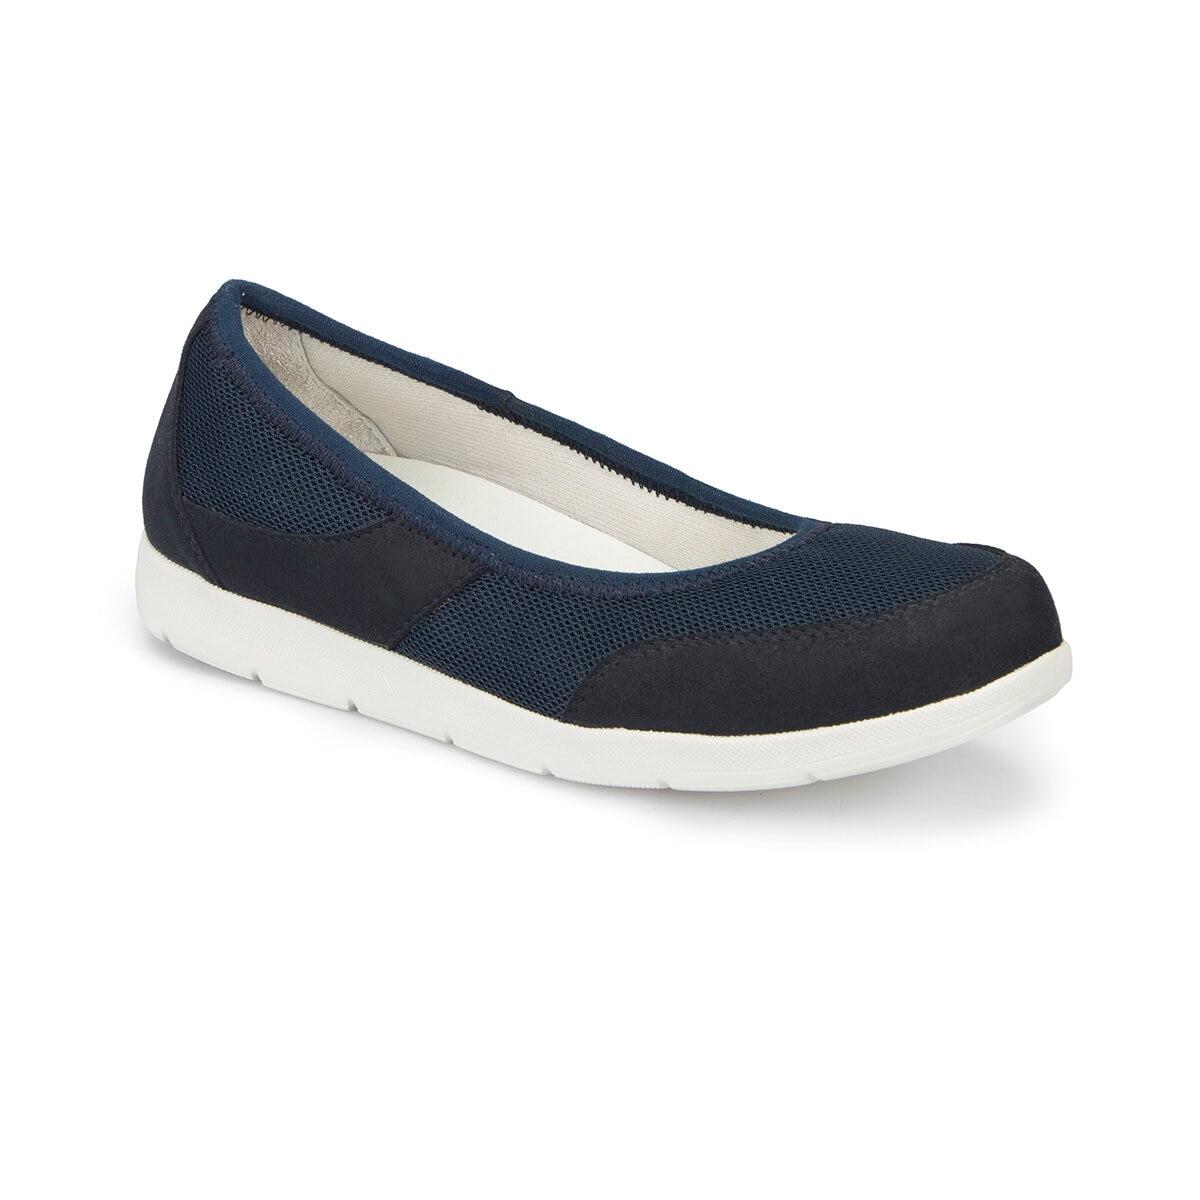 FLO 81. 111251.Z Navy Blue Women Basic Comfort Polaris